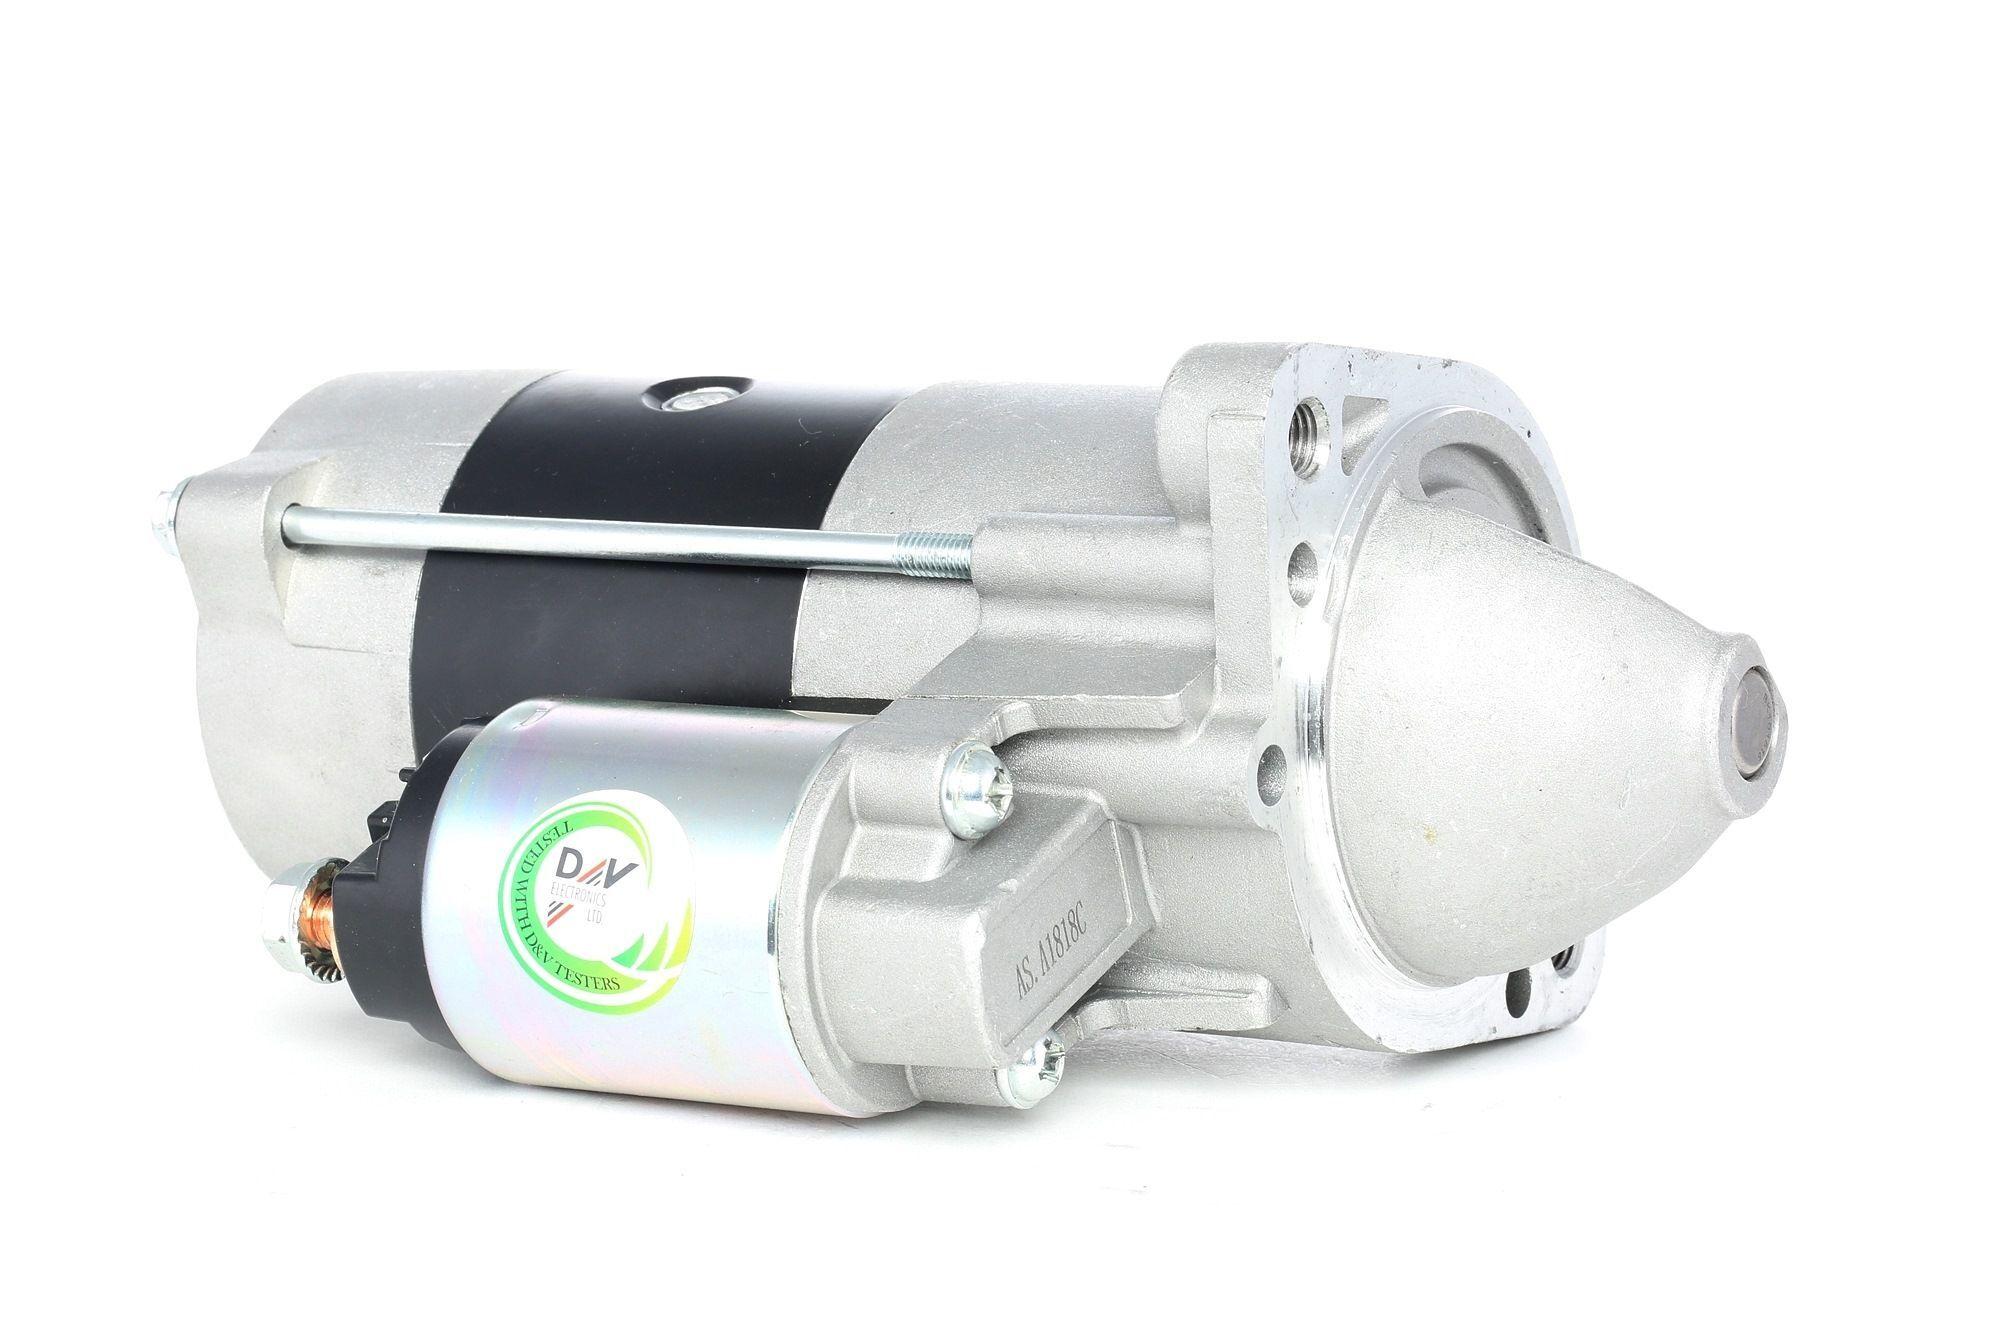 AS-PL Starttimoottori Brand new AS-PL Alternator 63321862 S5026 Startti,Käynnistinmoottori HYUNDAI,KIA,MITSUBISHI,H-1 Kasten,H-1 / STAREX